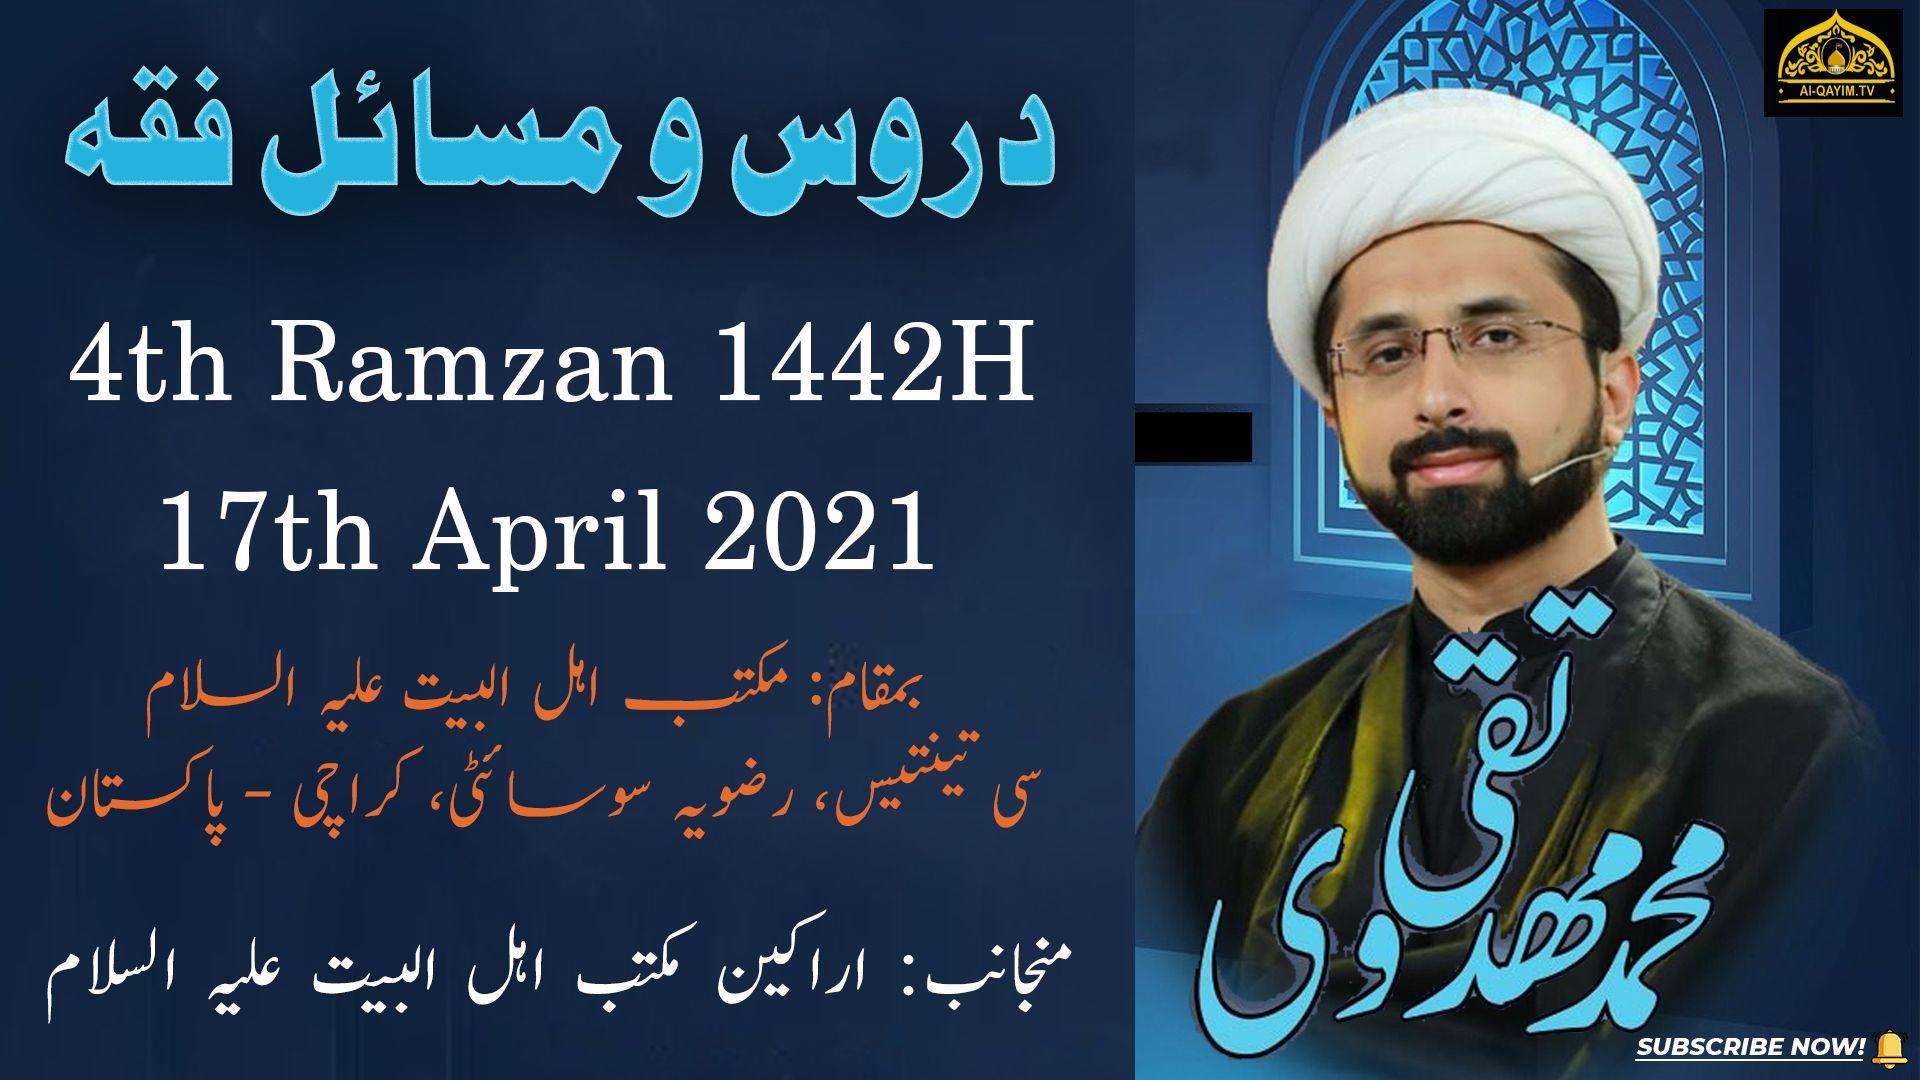 Moulana Muhammad Taqi Mehdavi | Dars Wo Masail Fiqae | 4th Ramzan 2021 | Maktab-e-Ahlebait - Karachi